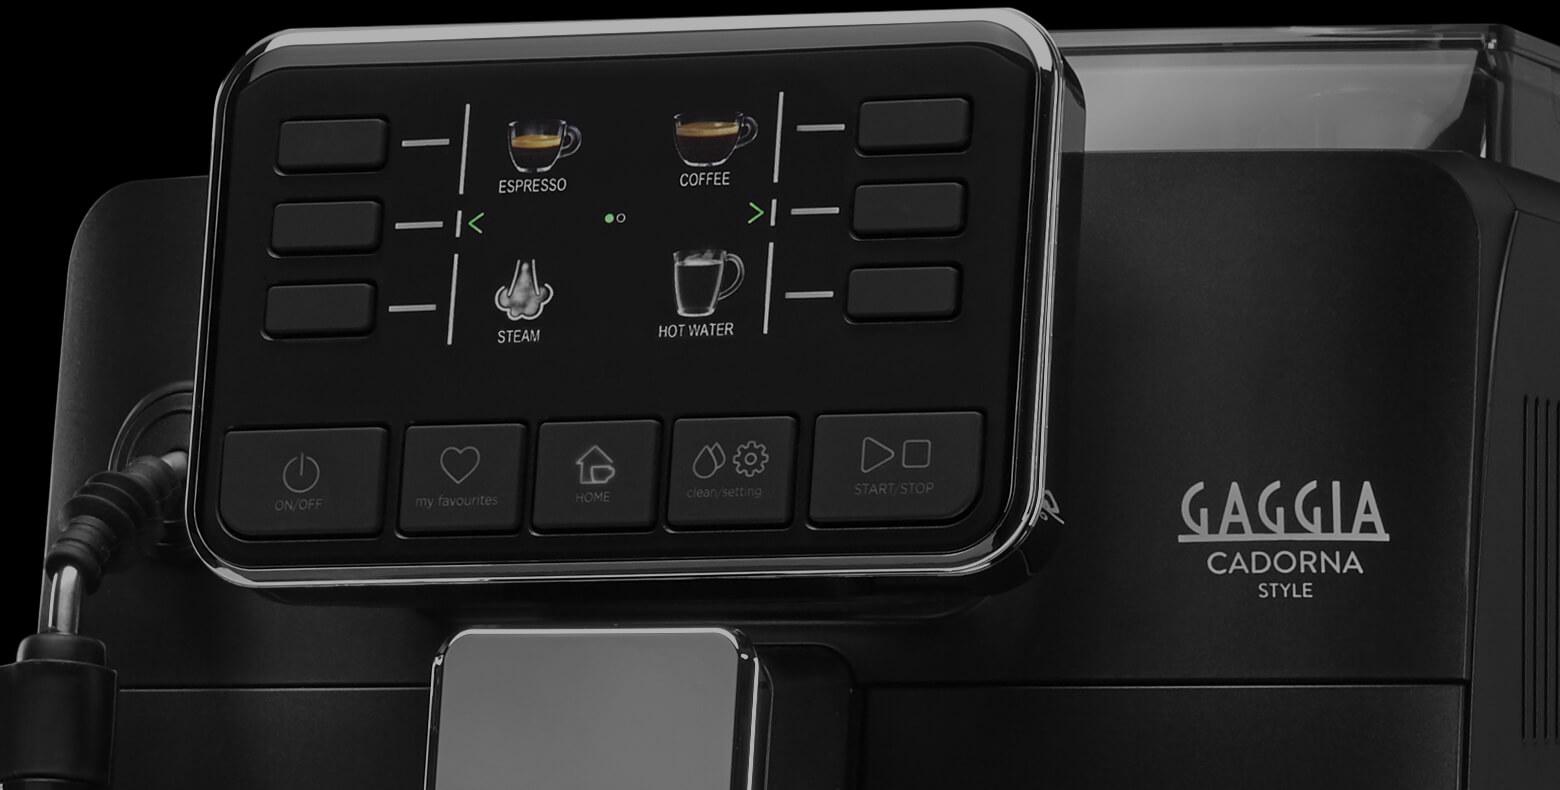 GAGGIA CADORNA STYLE BLACK панель управления